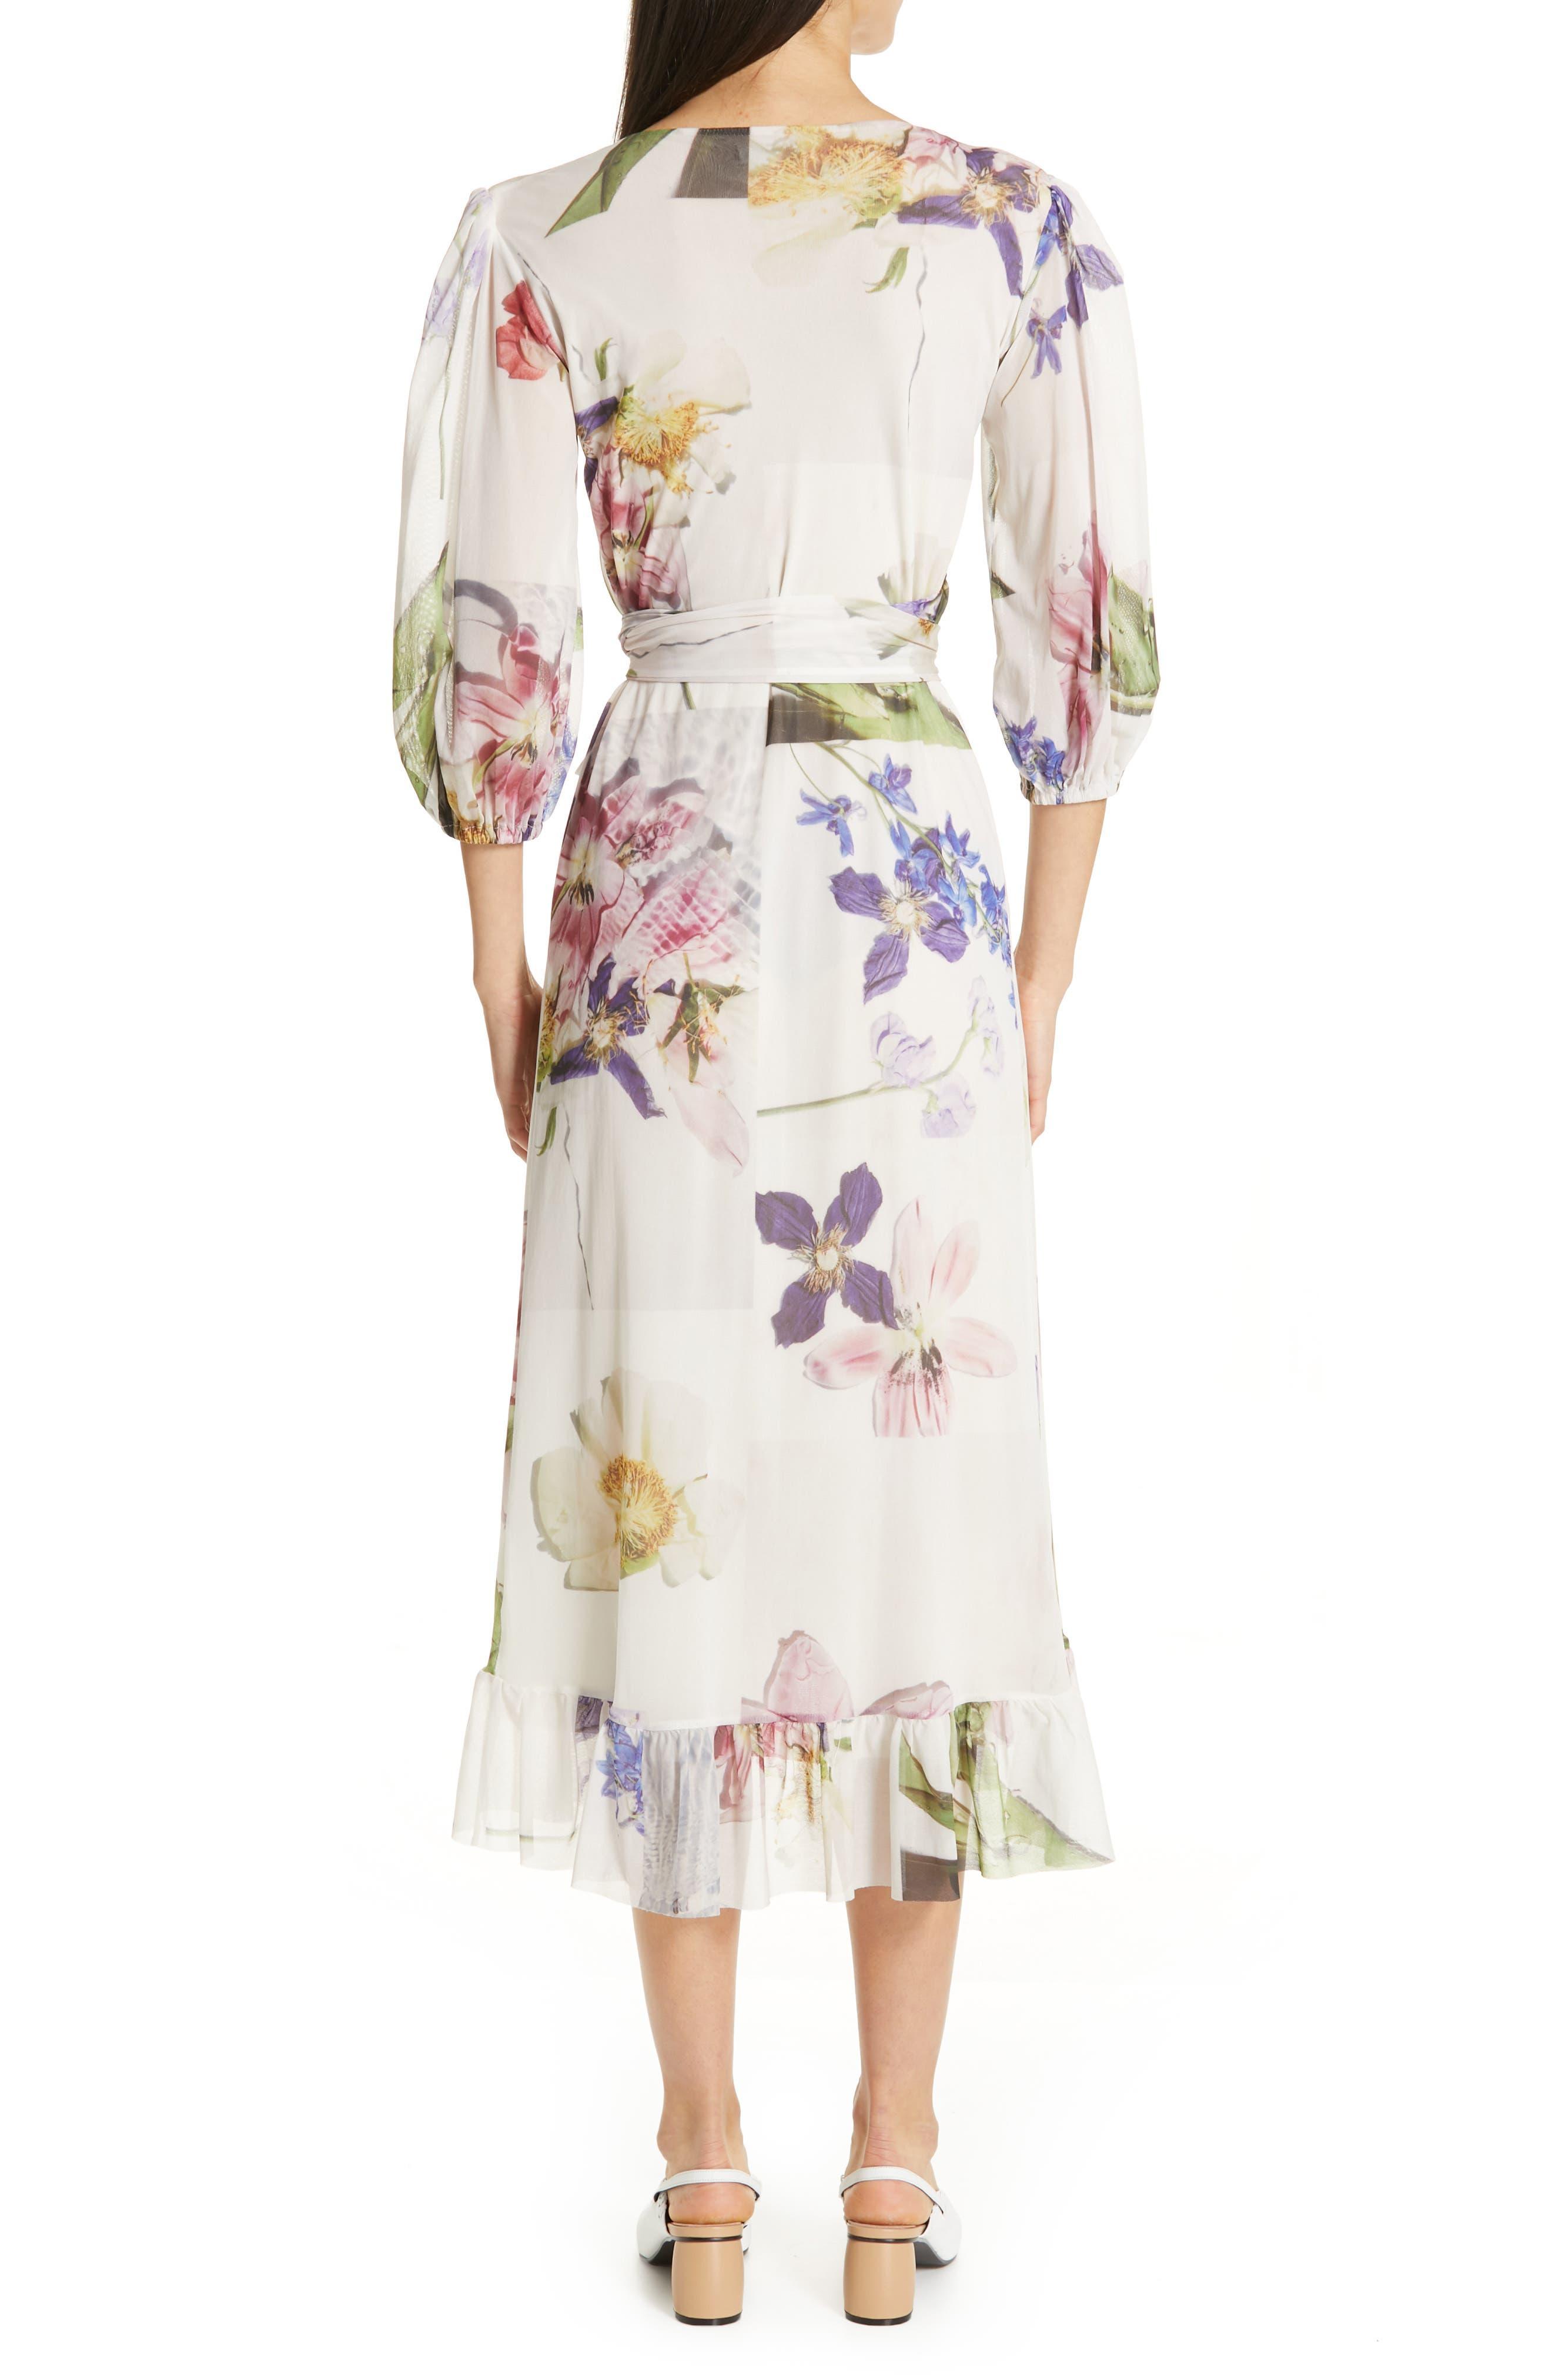 GANNI,                             Floral Print Mesh Dress,                             Alternate thumbnail 2, color,                             BRIGHT WHITE